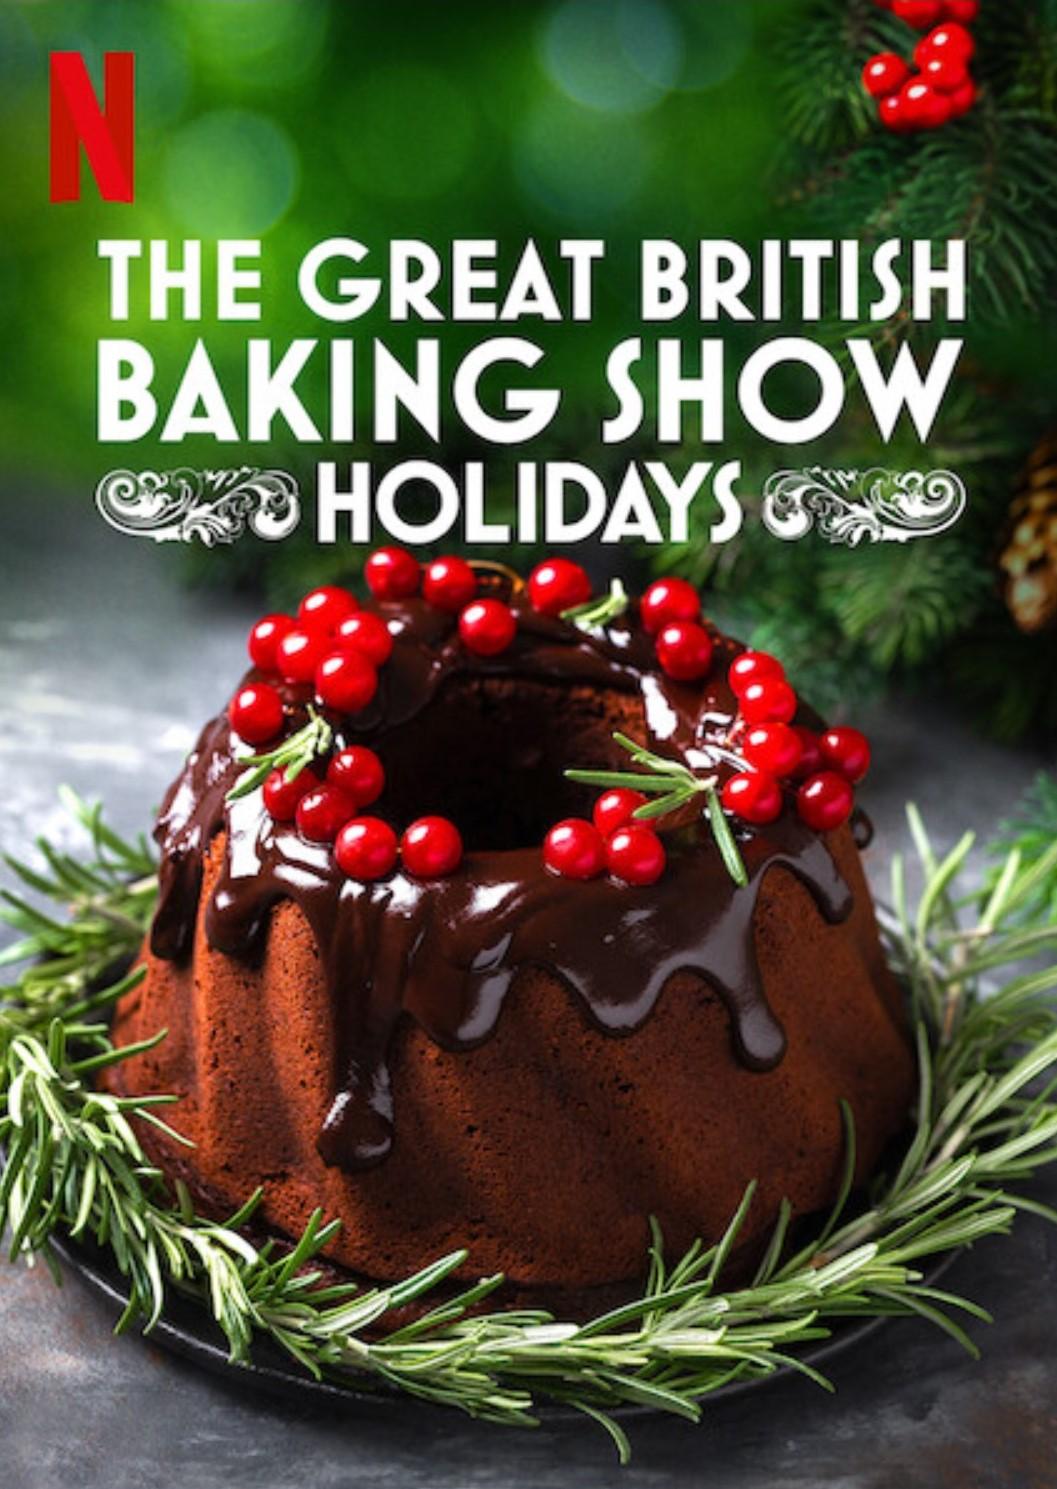 The Great British Baking Show Holidays Season 3